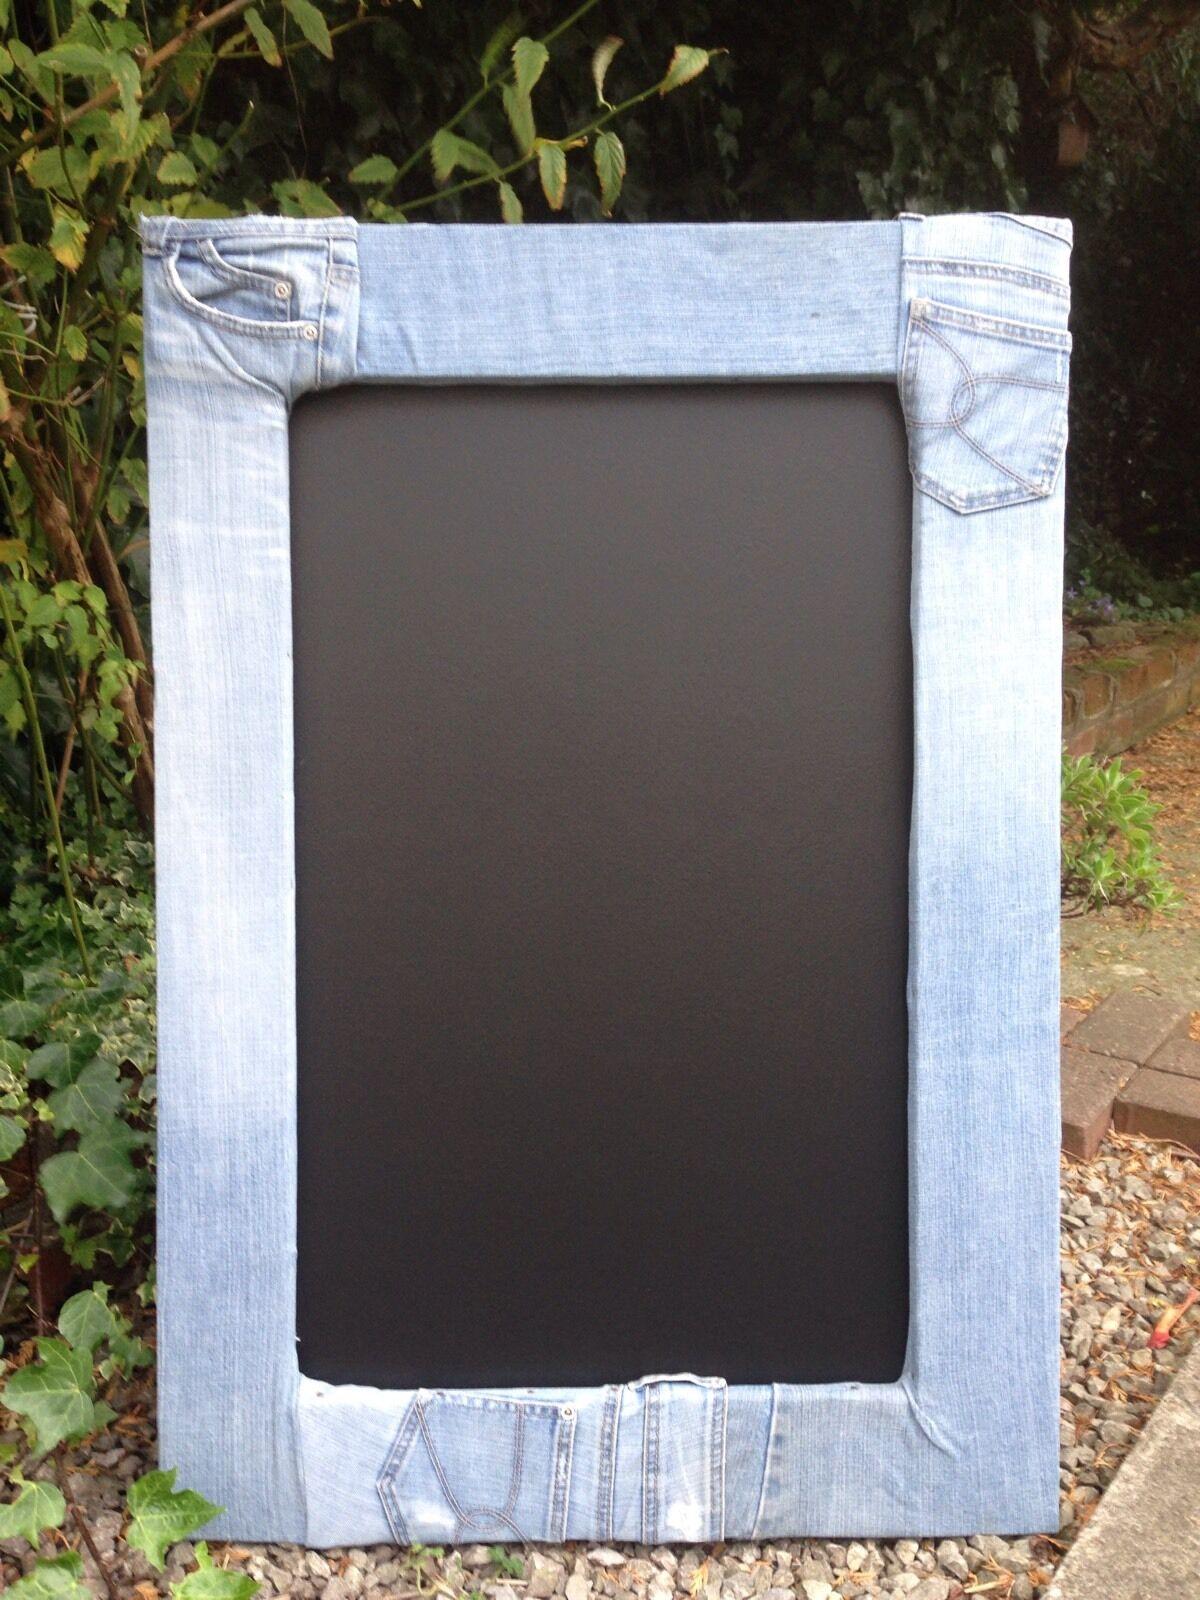 Blau Chalkboard Menu Chalkboard Blau Menu Clothes Menu Chalkboard Denim Menu